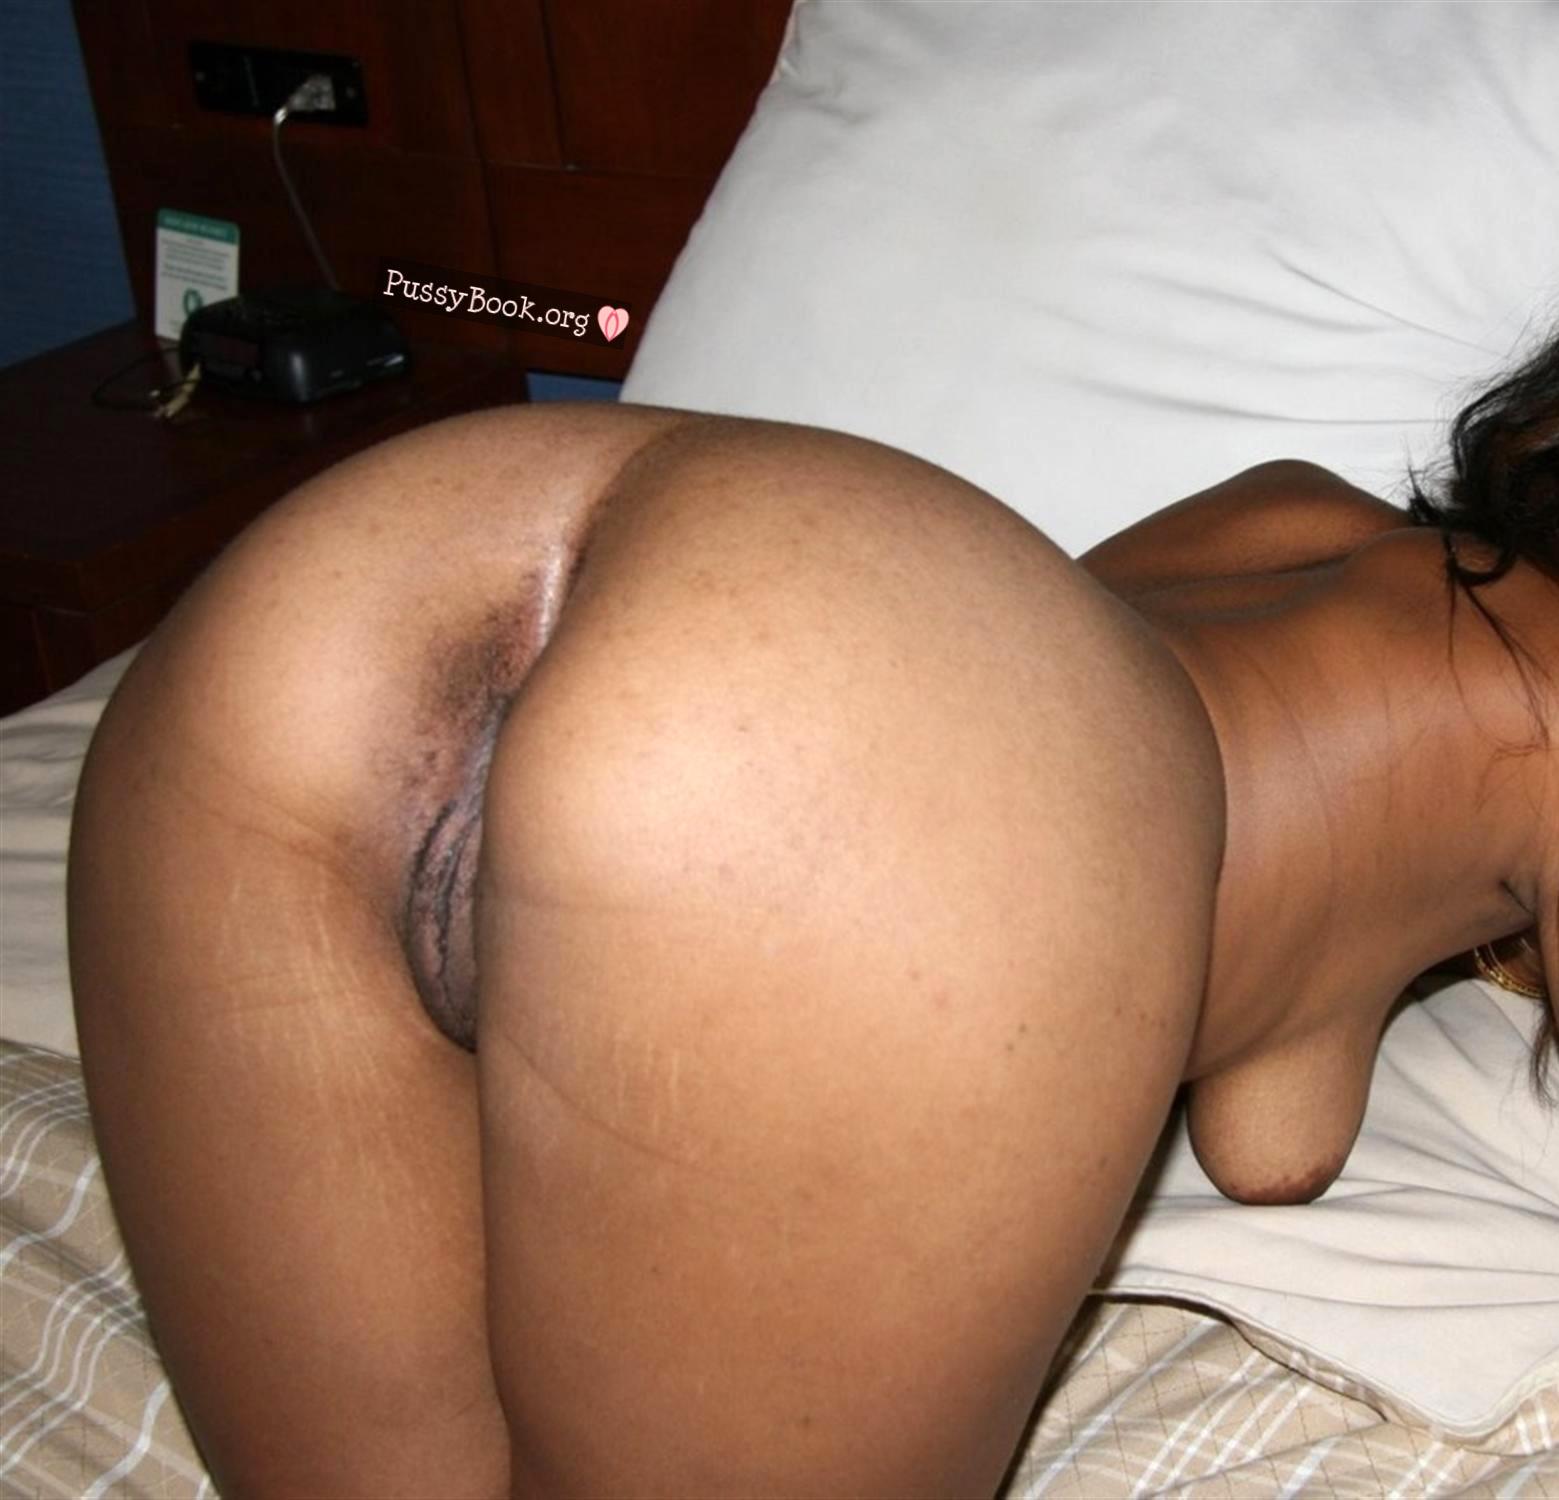 Black woman bare butt